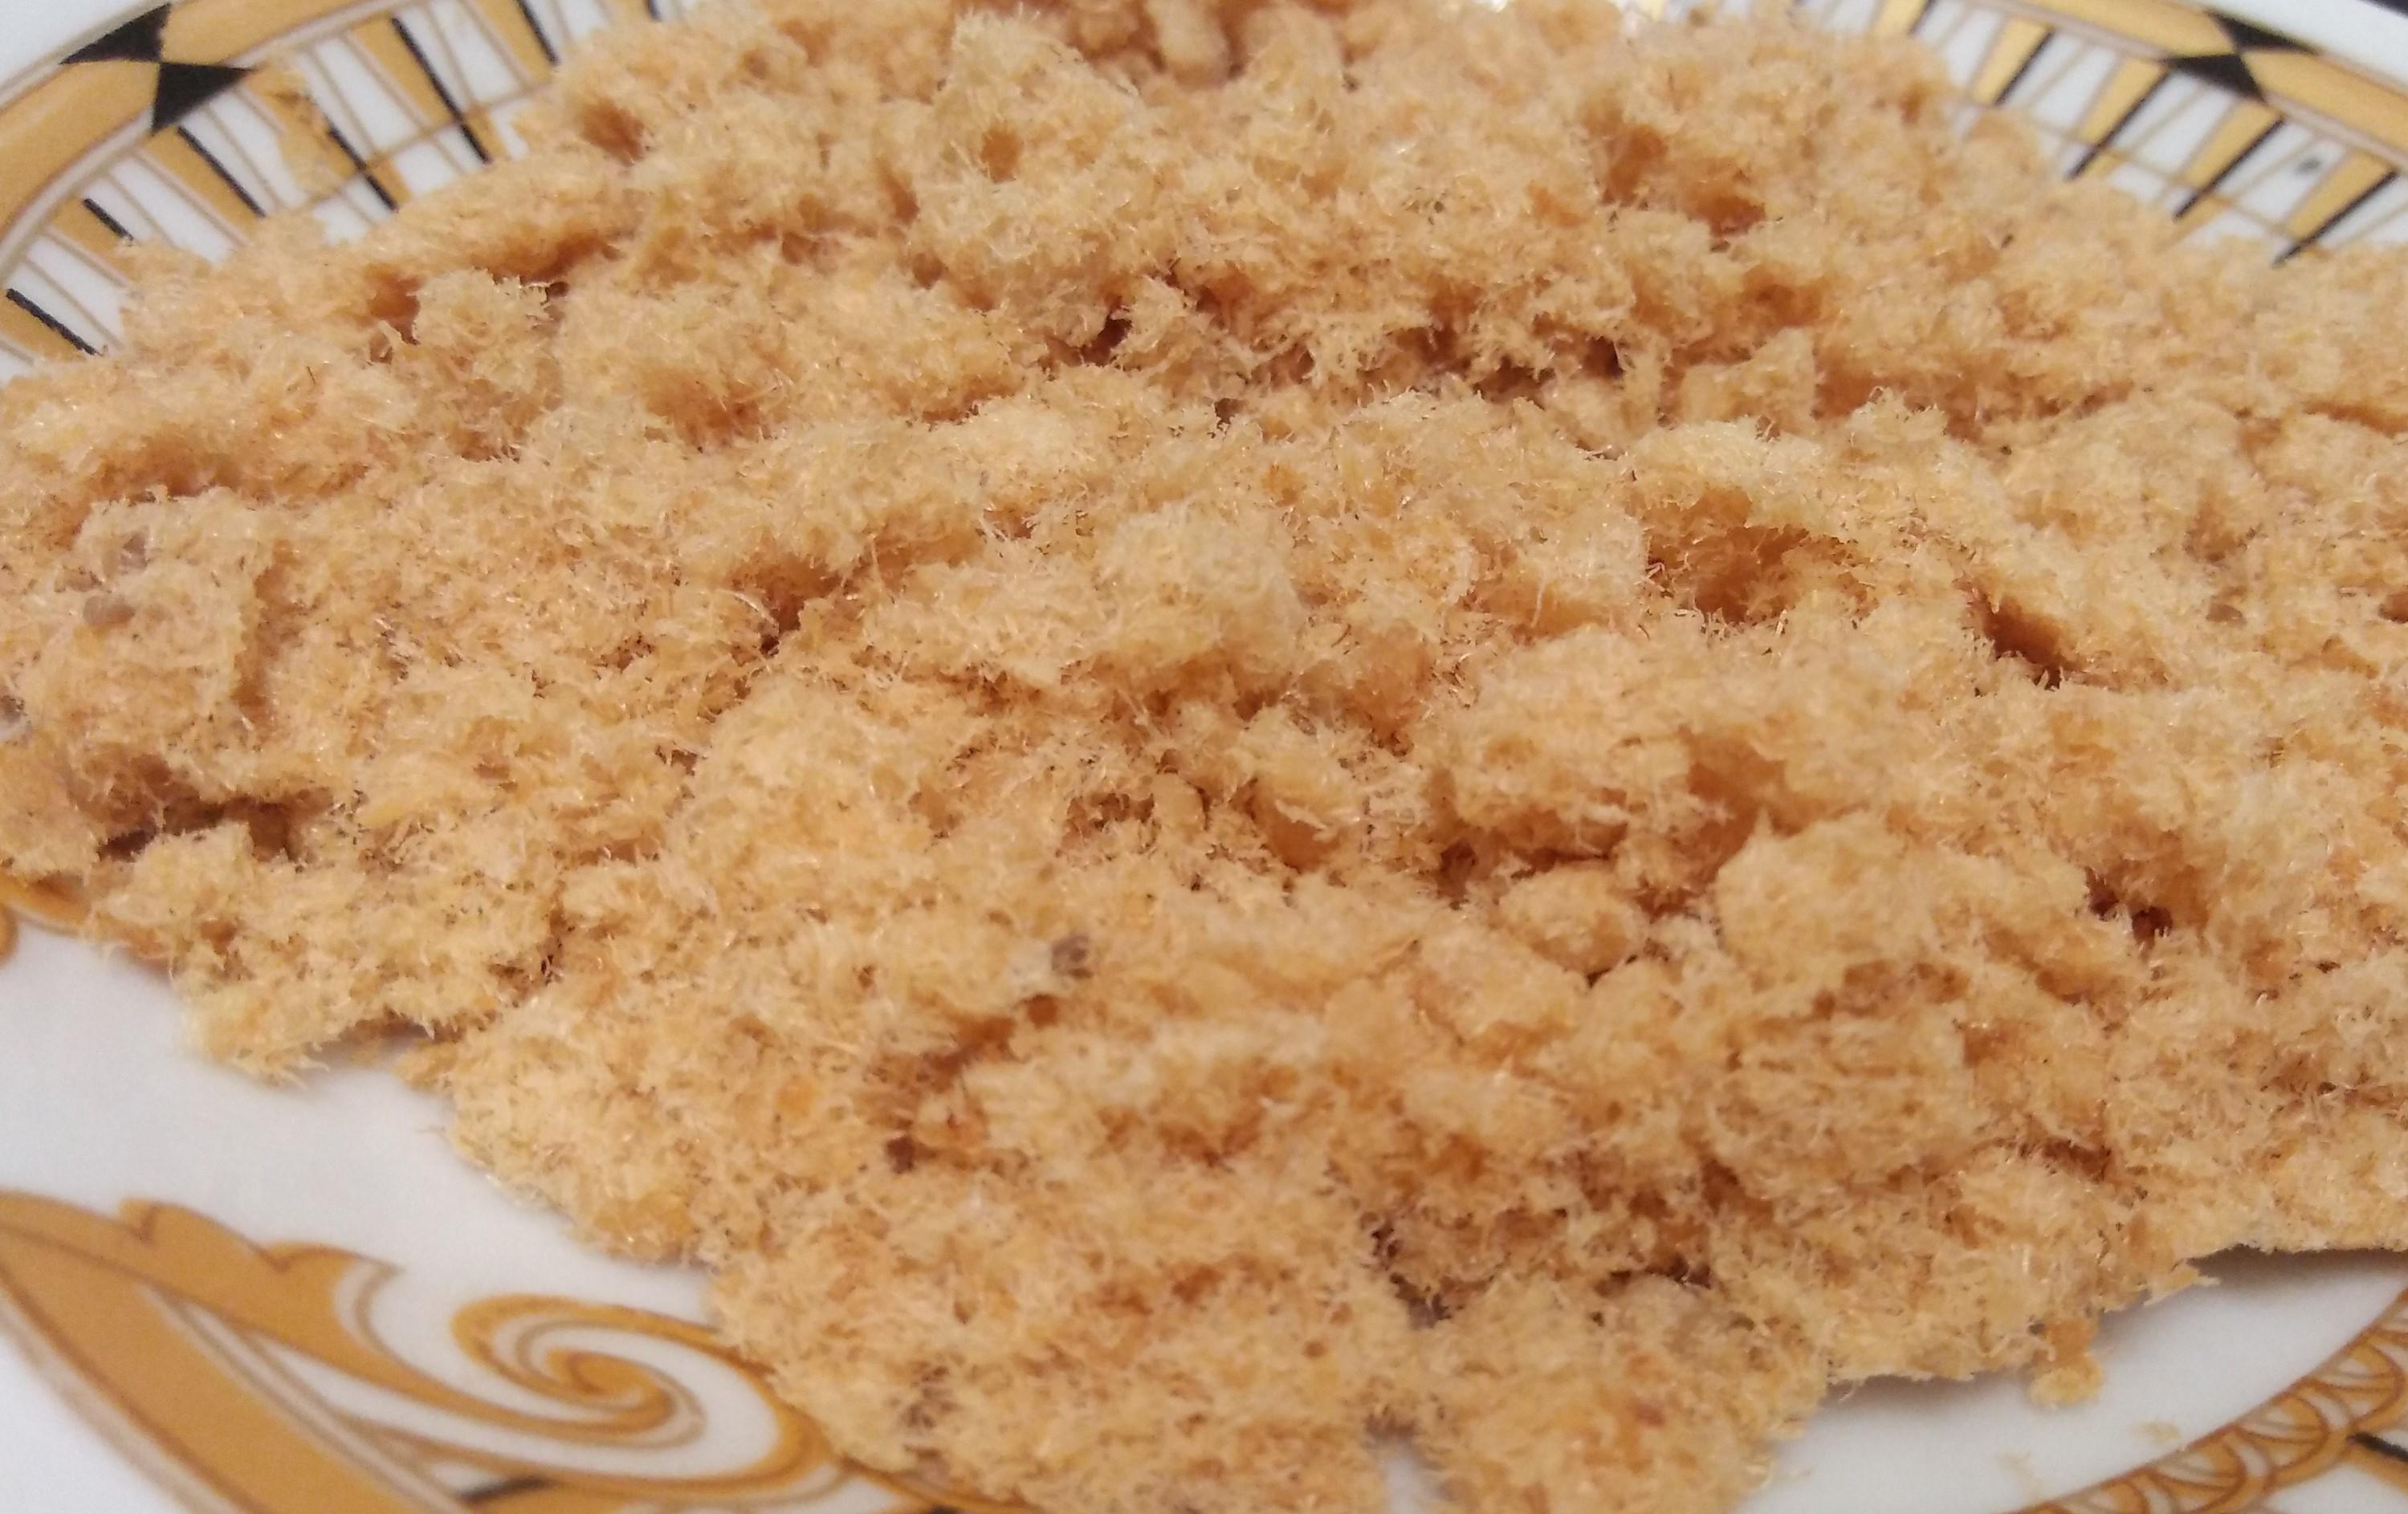 Dried Fish Powder